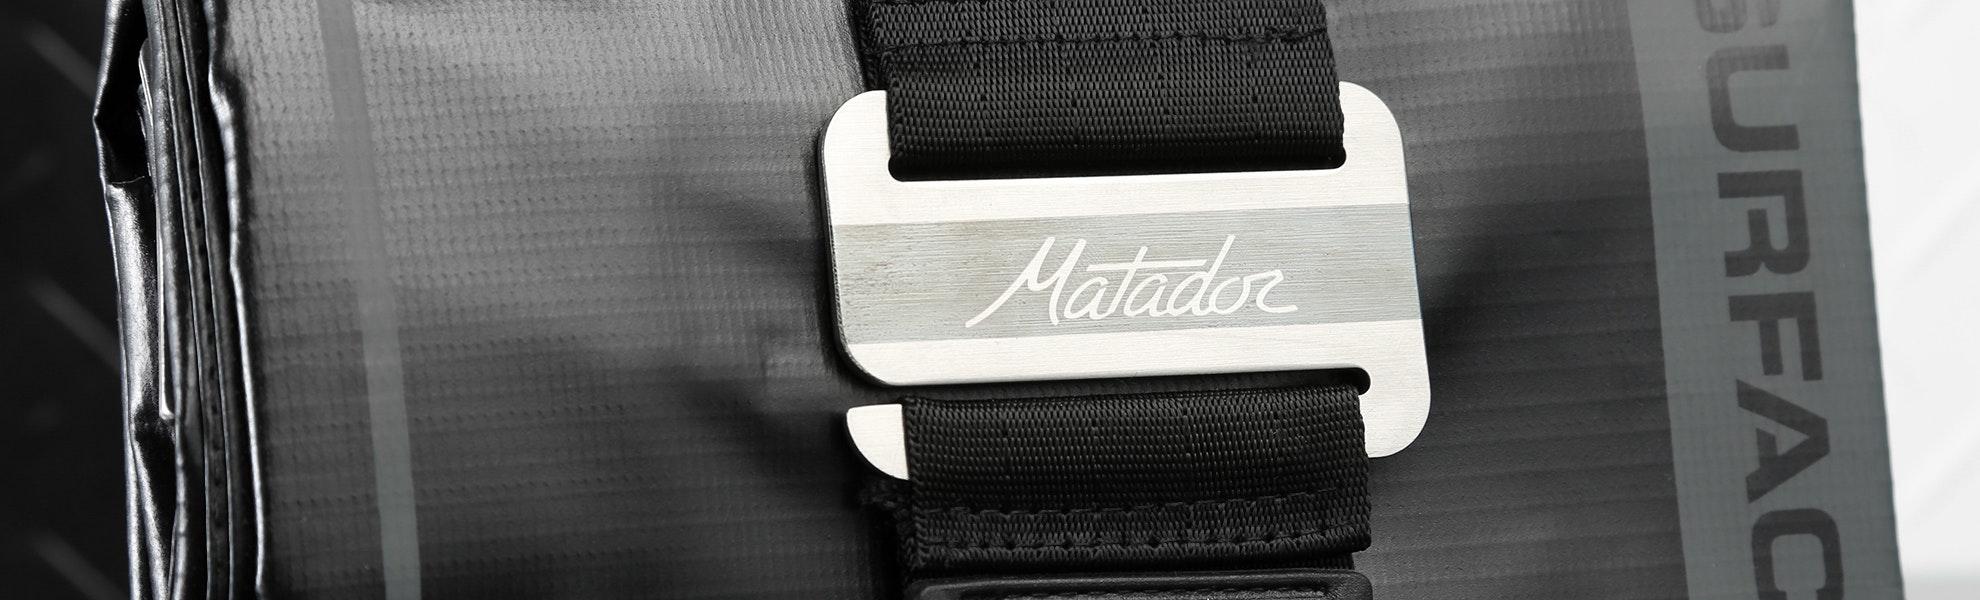 Matador Work Surface